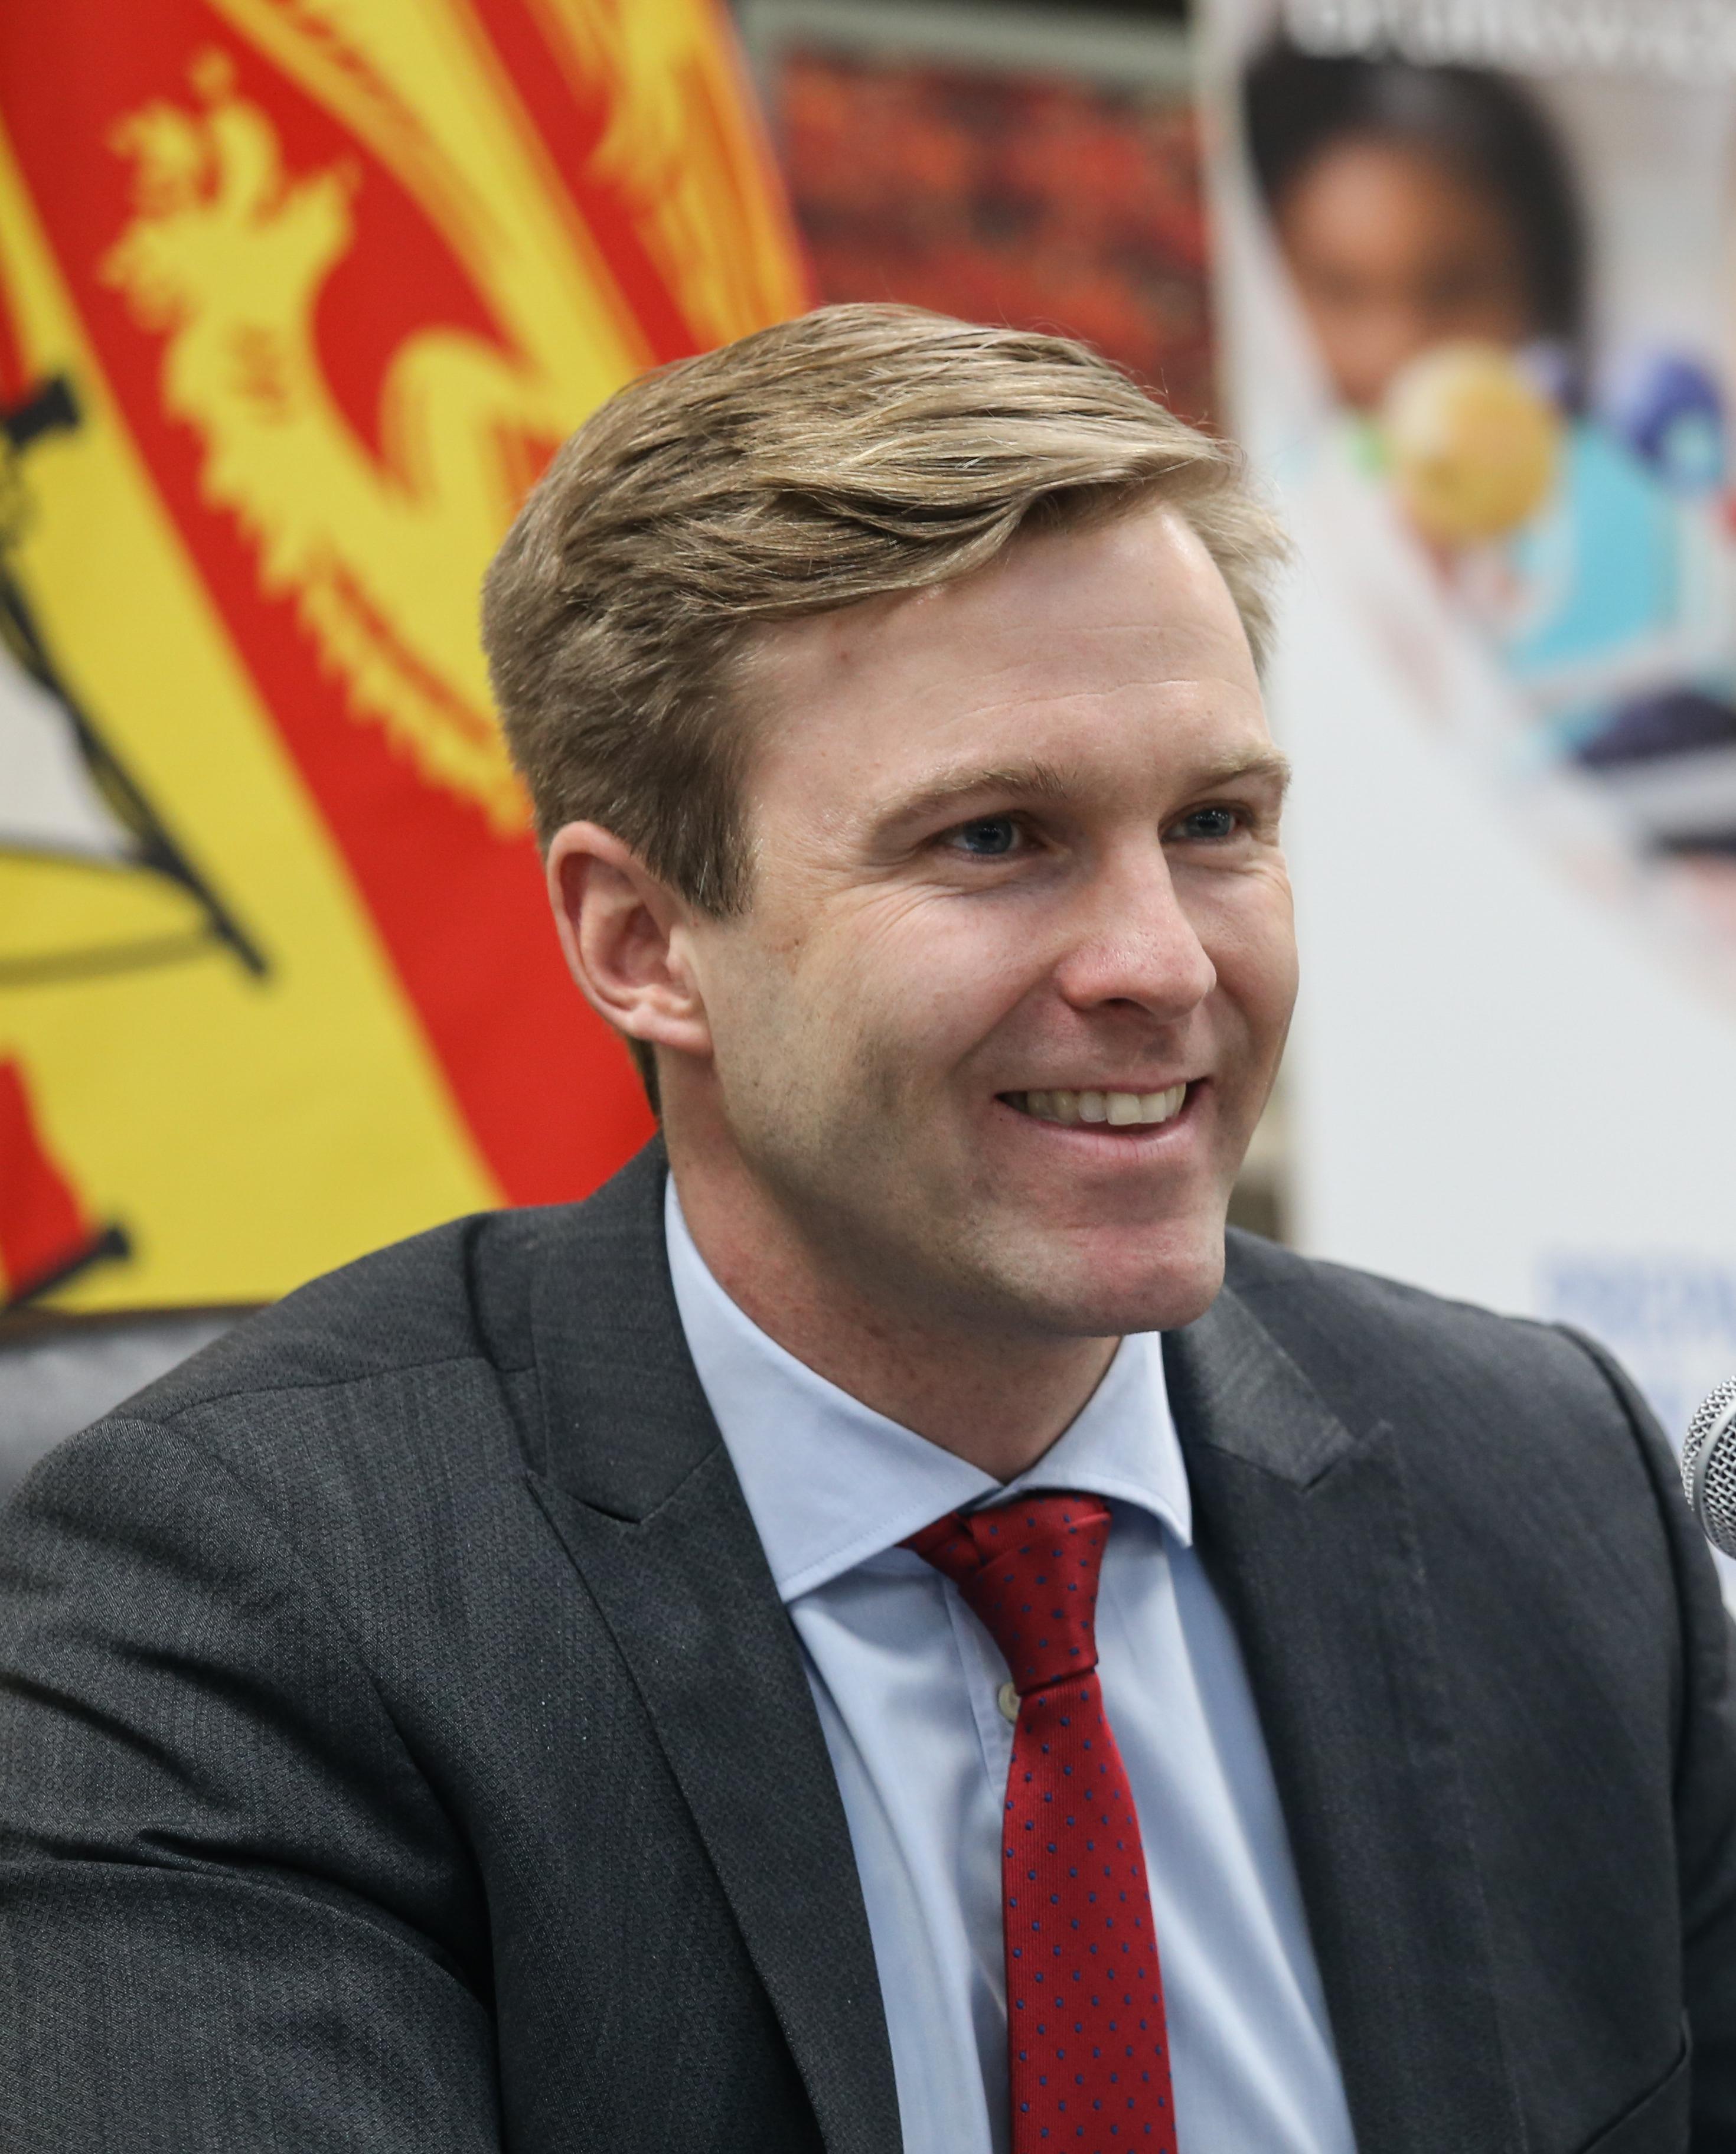 deccd225529a 2014 New Brunswick general election - Wikipedia